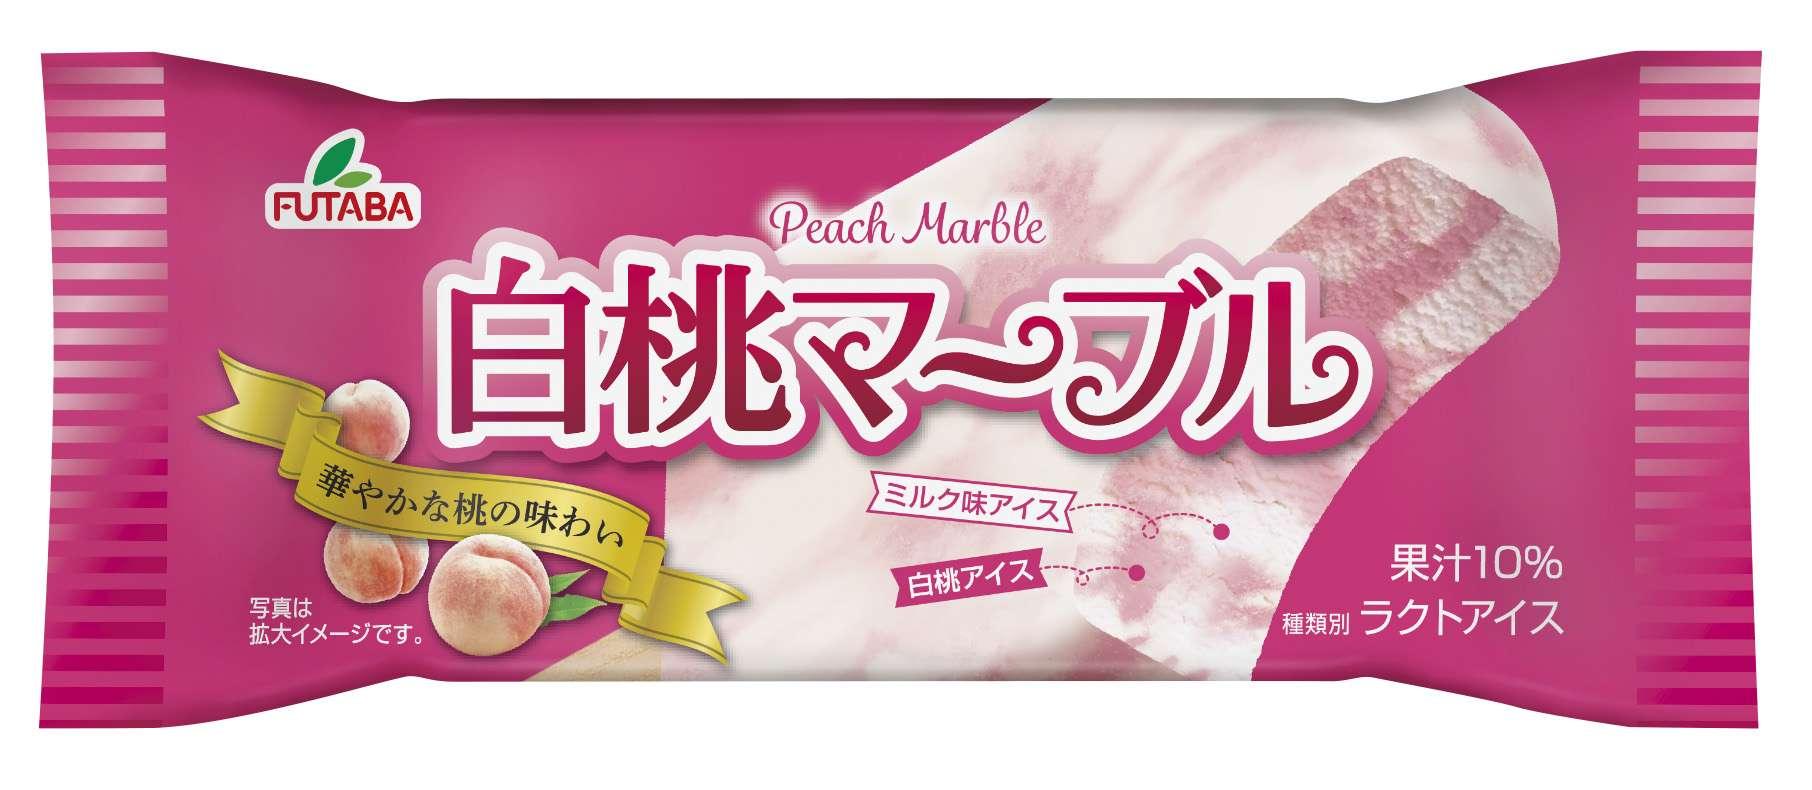 FUTABA White Peach Marble Ice bar